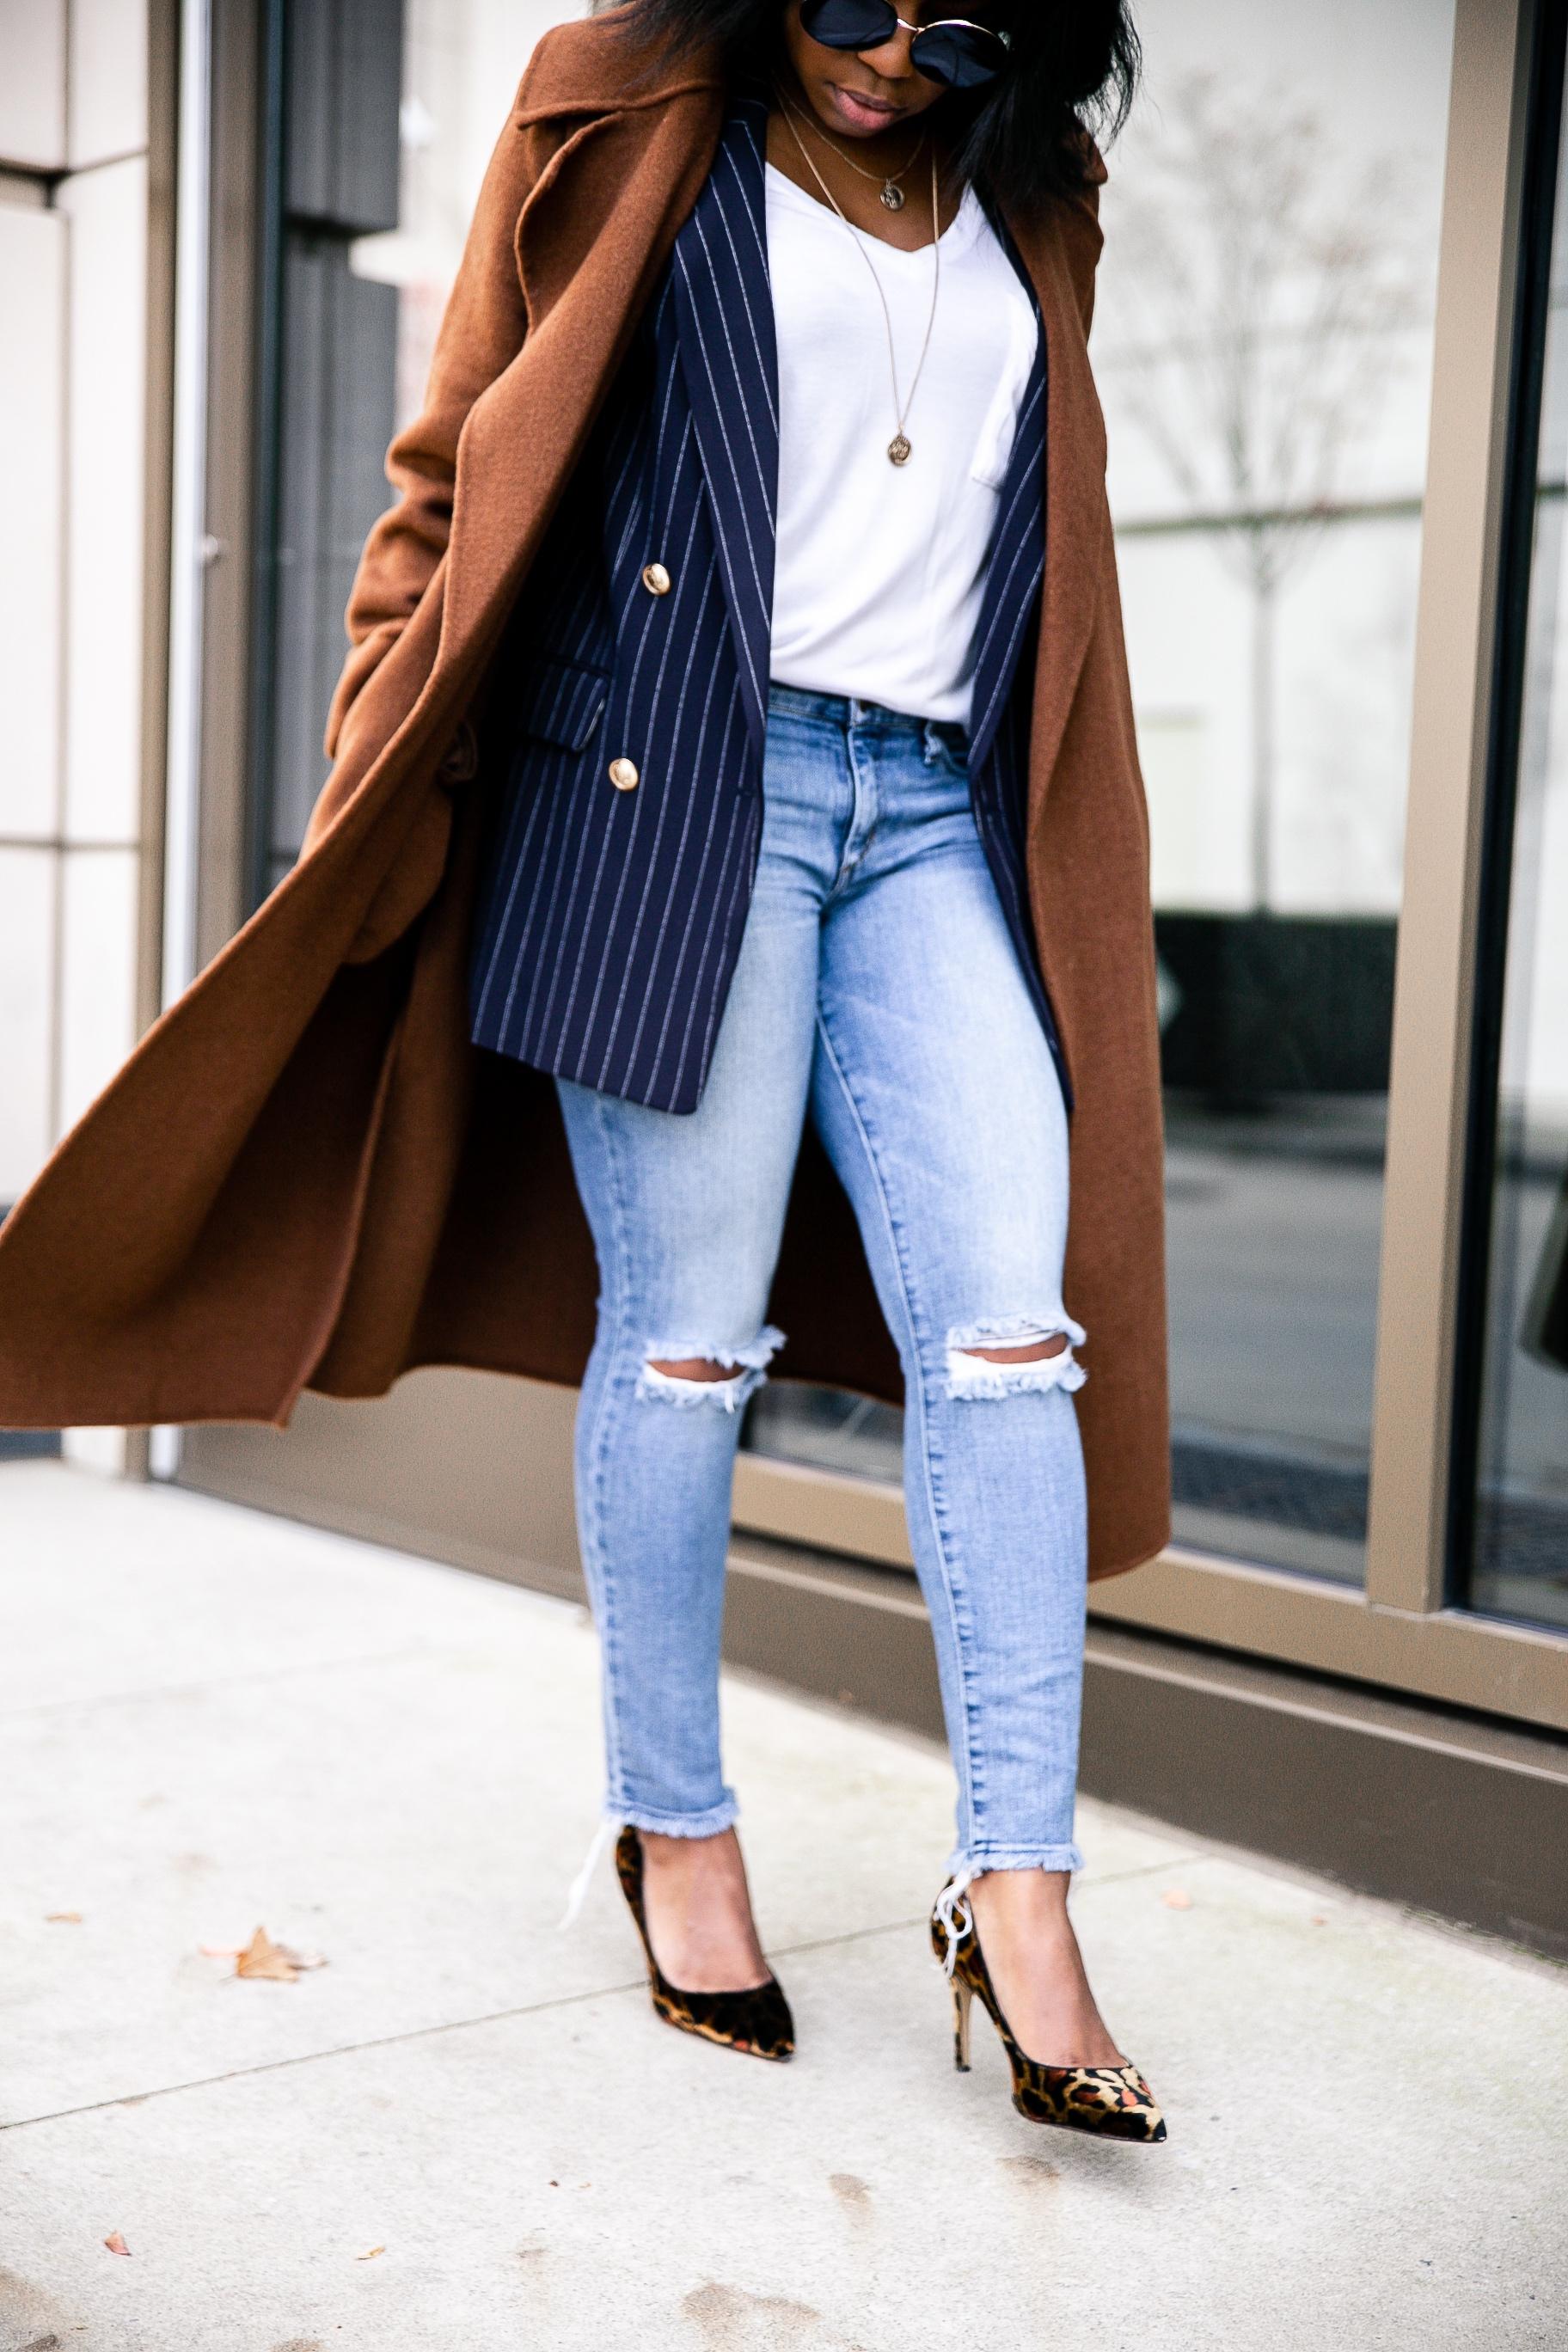 Blazer;  H&M  // Tee; Zara // Shoes; Ann Taylor - old // Sunglasses; Francesca's